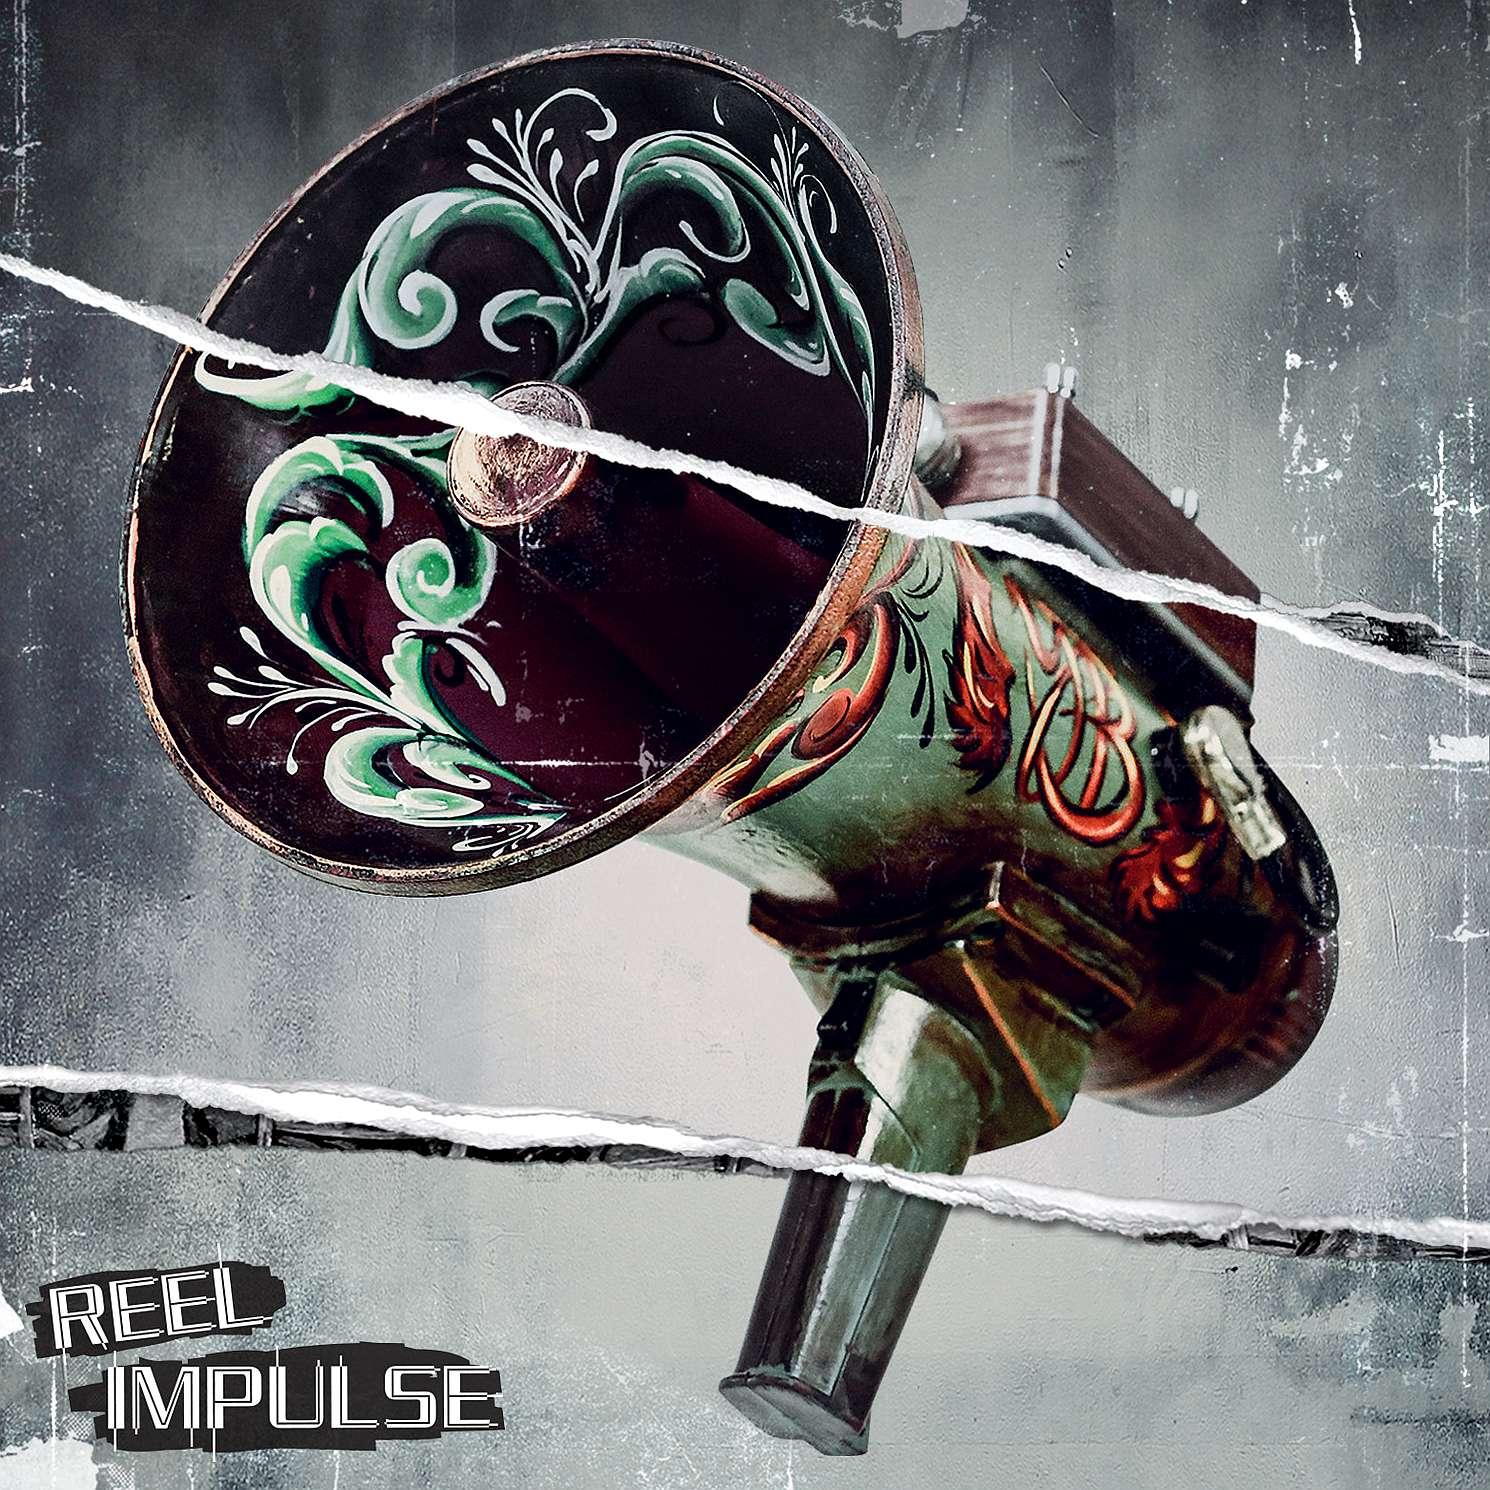 [Album] YB - Reel Impulse